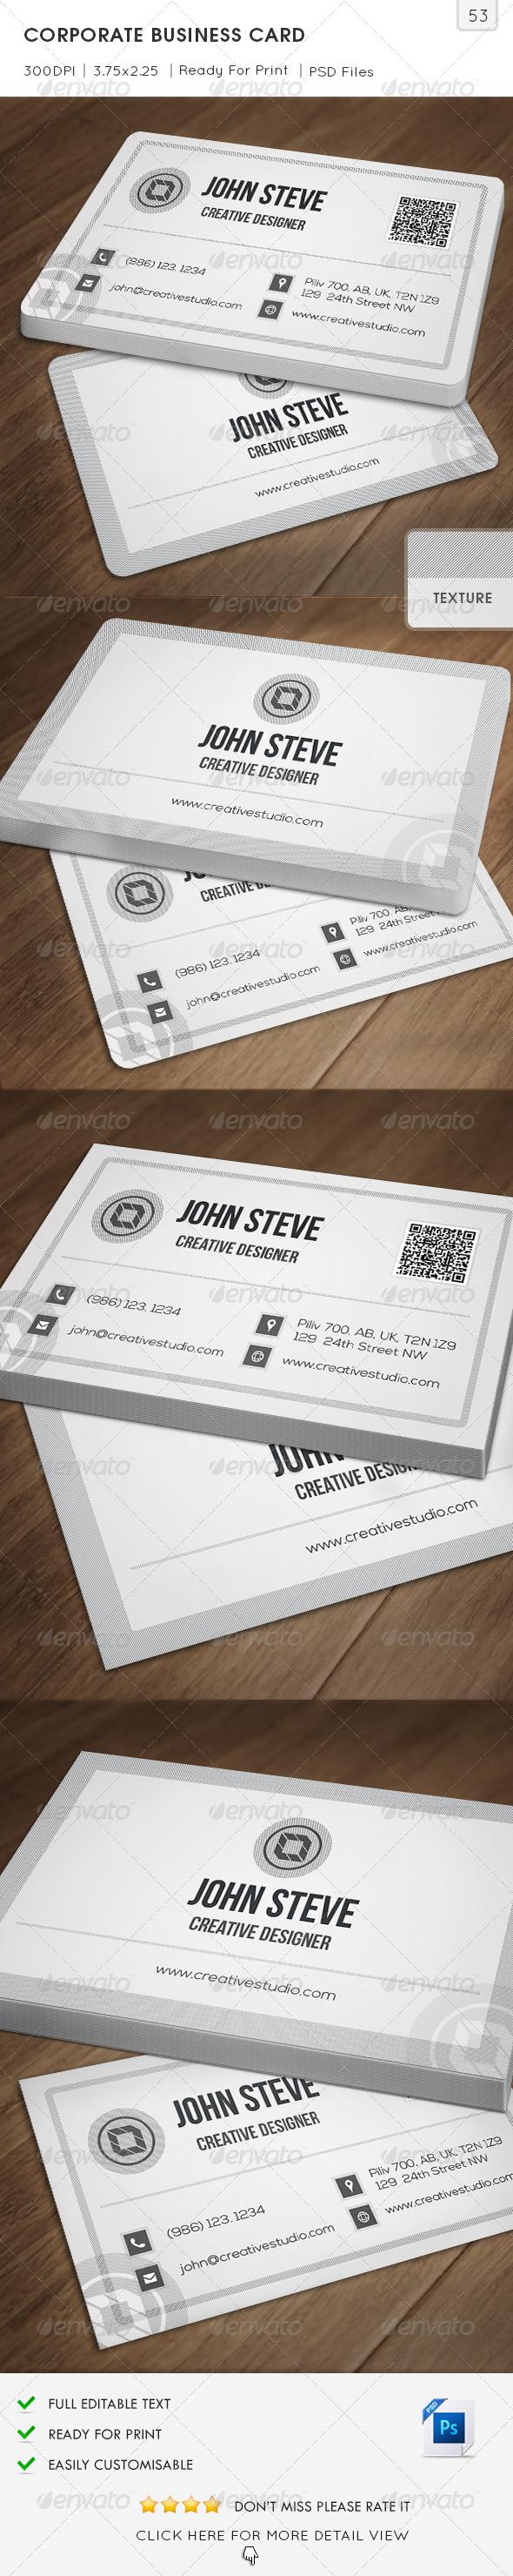 Corporate Business Card v53 - Corporate Business Cards